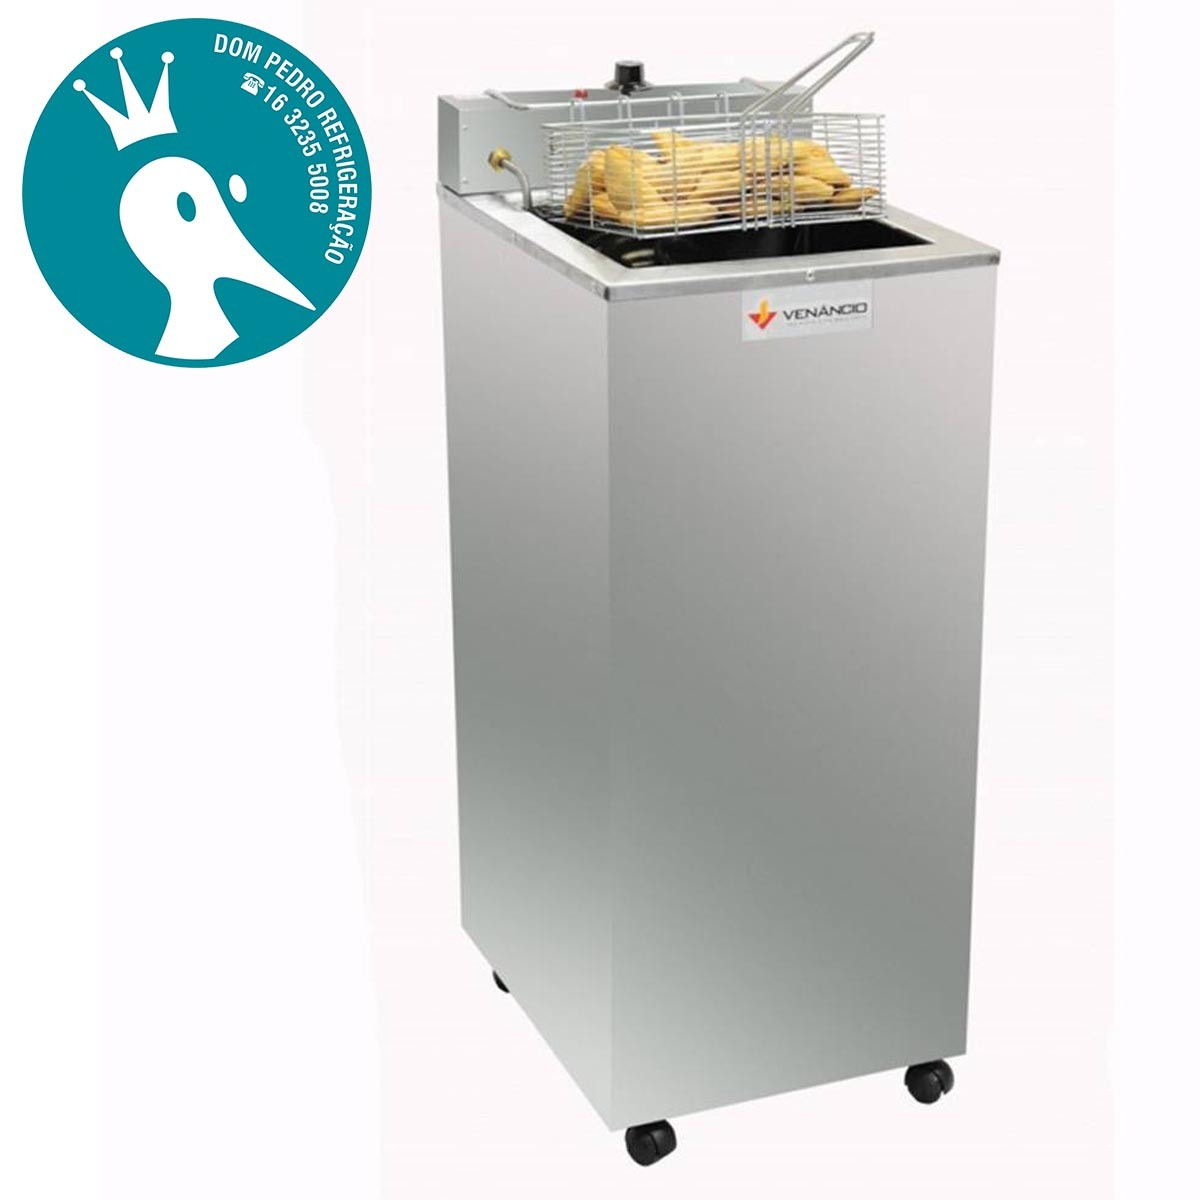 Fritadeira Elétrica Industrial de Gabinete Água/Óleo 23 Litros - Venâncio SFAO5